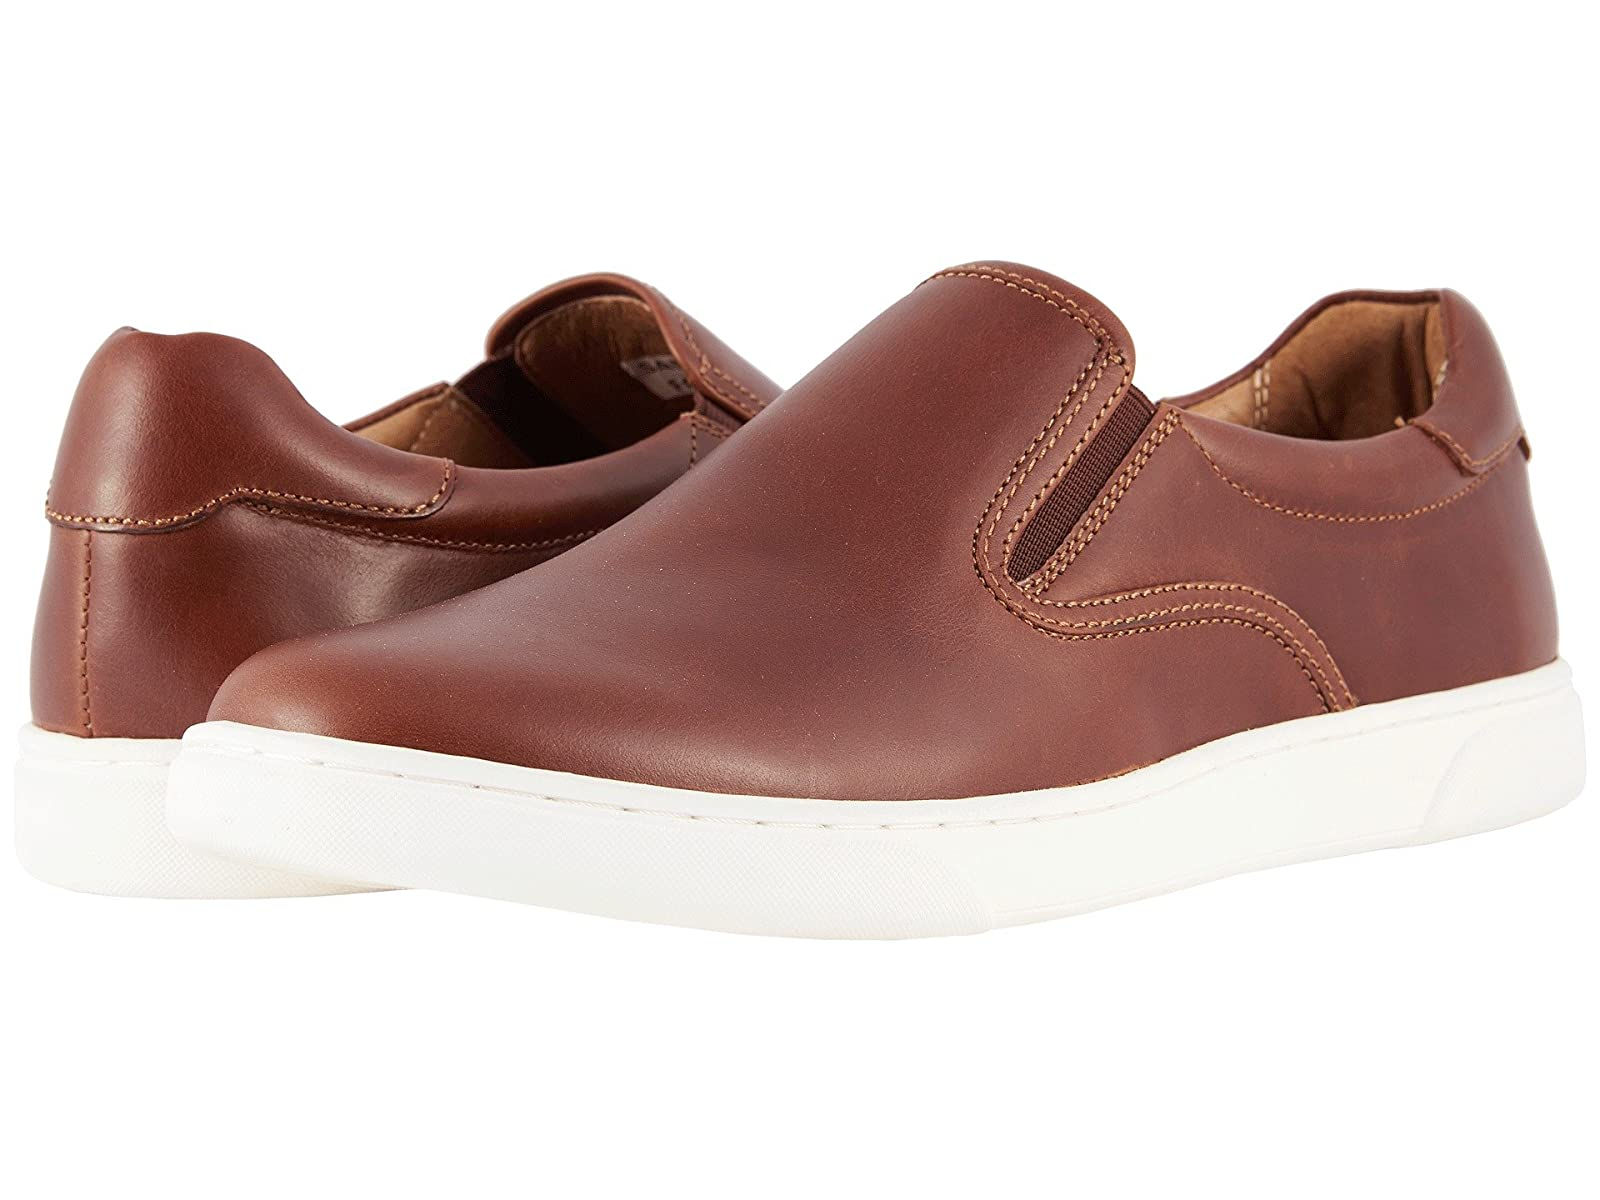 VIONIC BrodyAtmospheric grades have affordable shoes